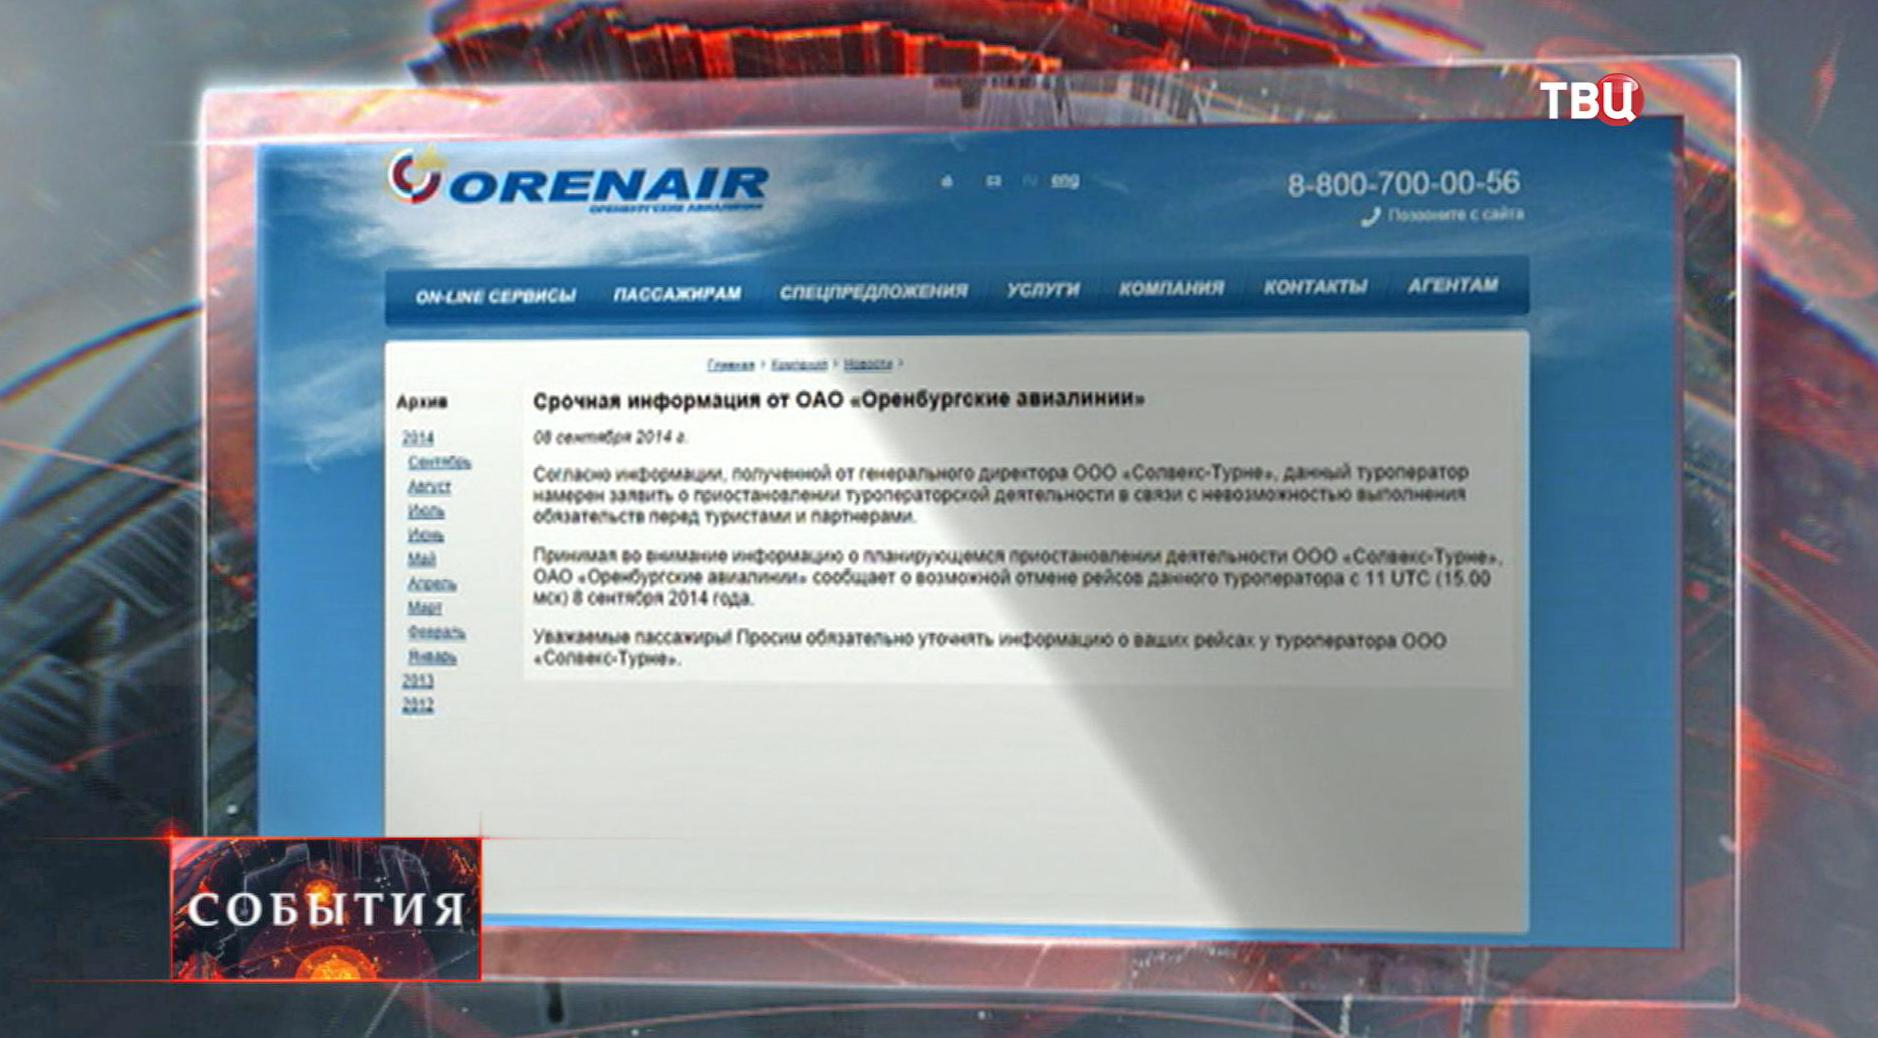 Сайт orenair